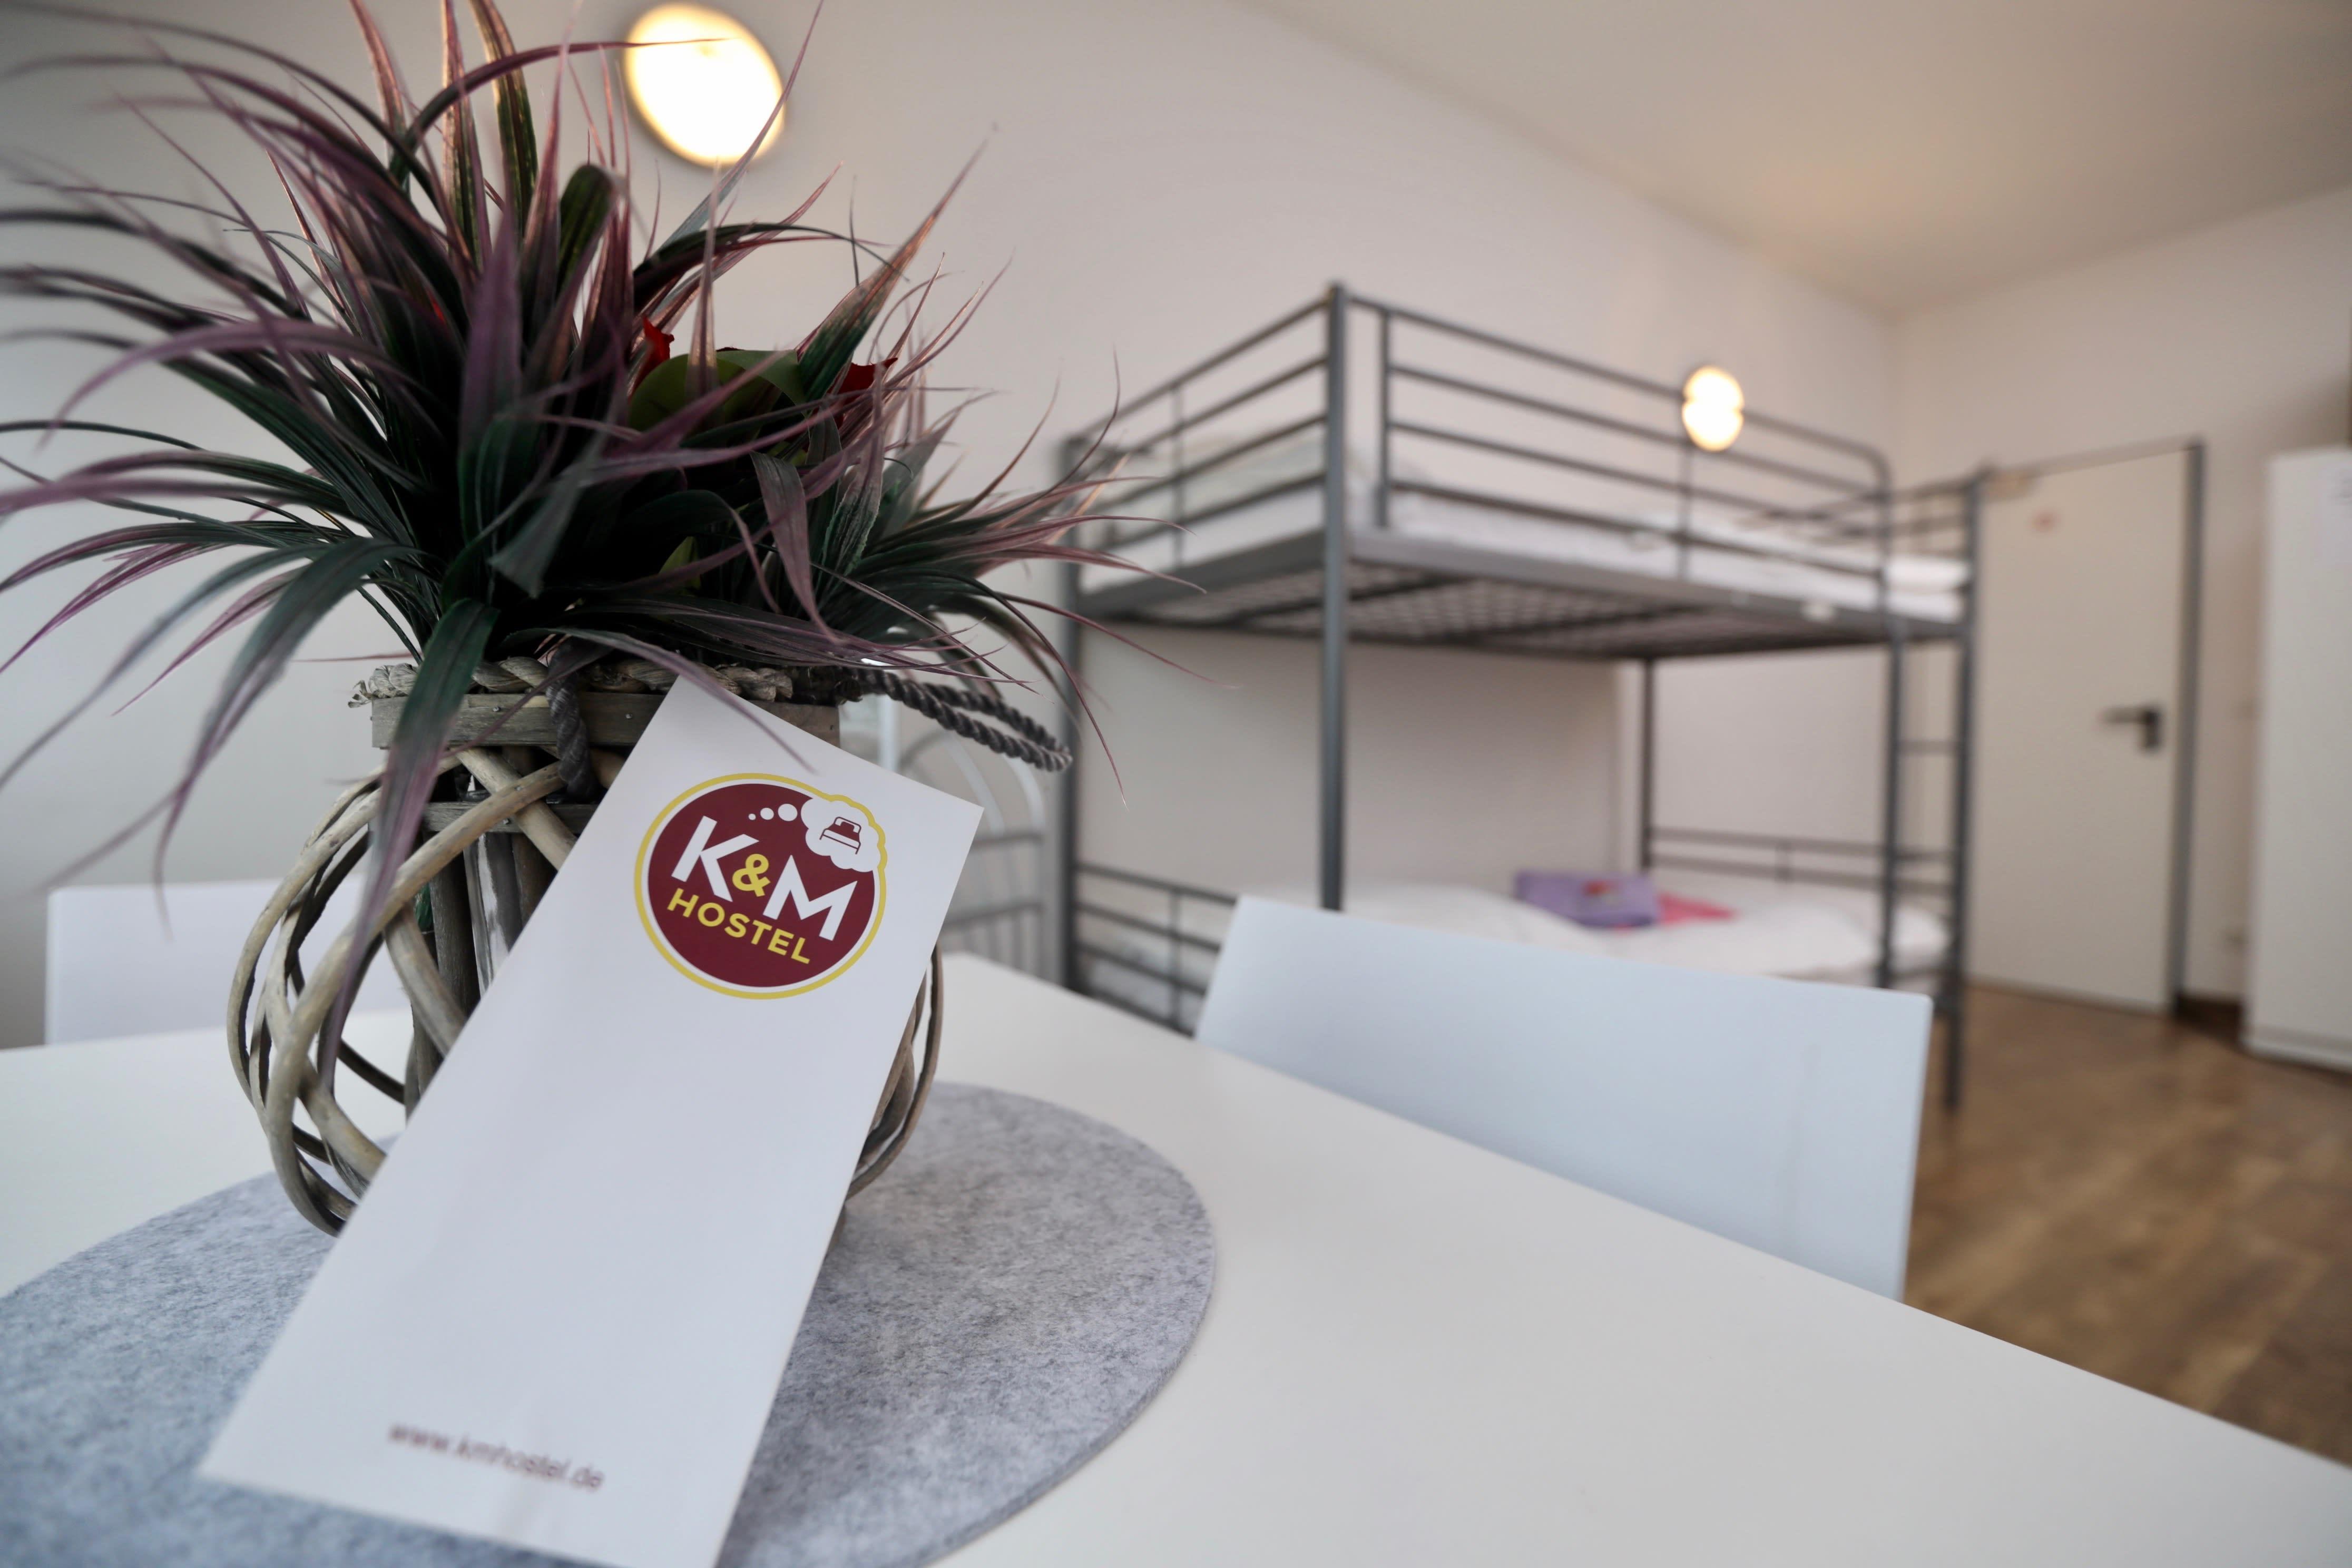 HOSTEL - K&M Hostel